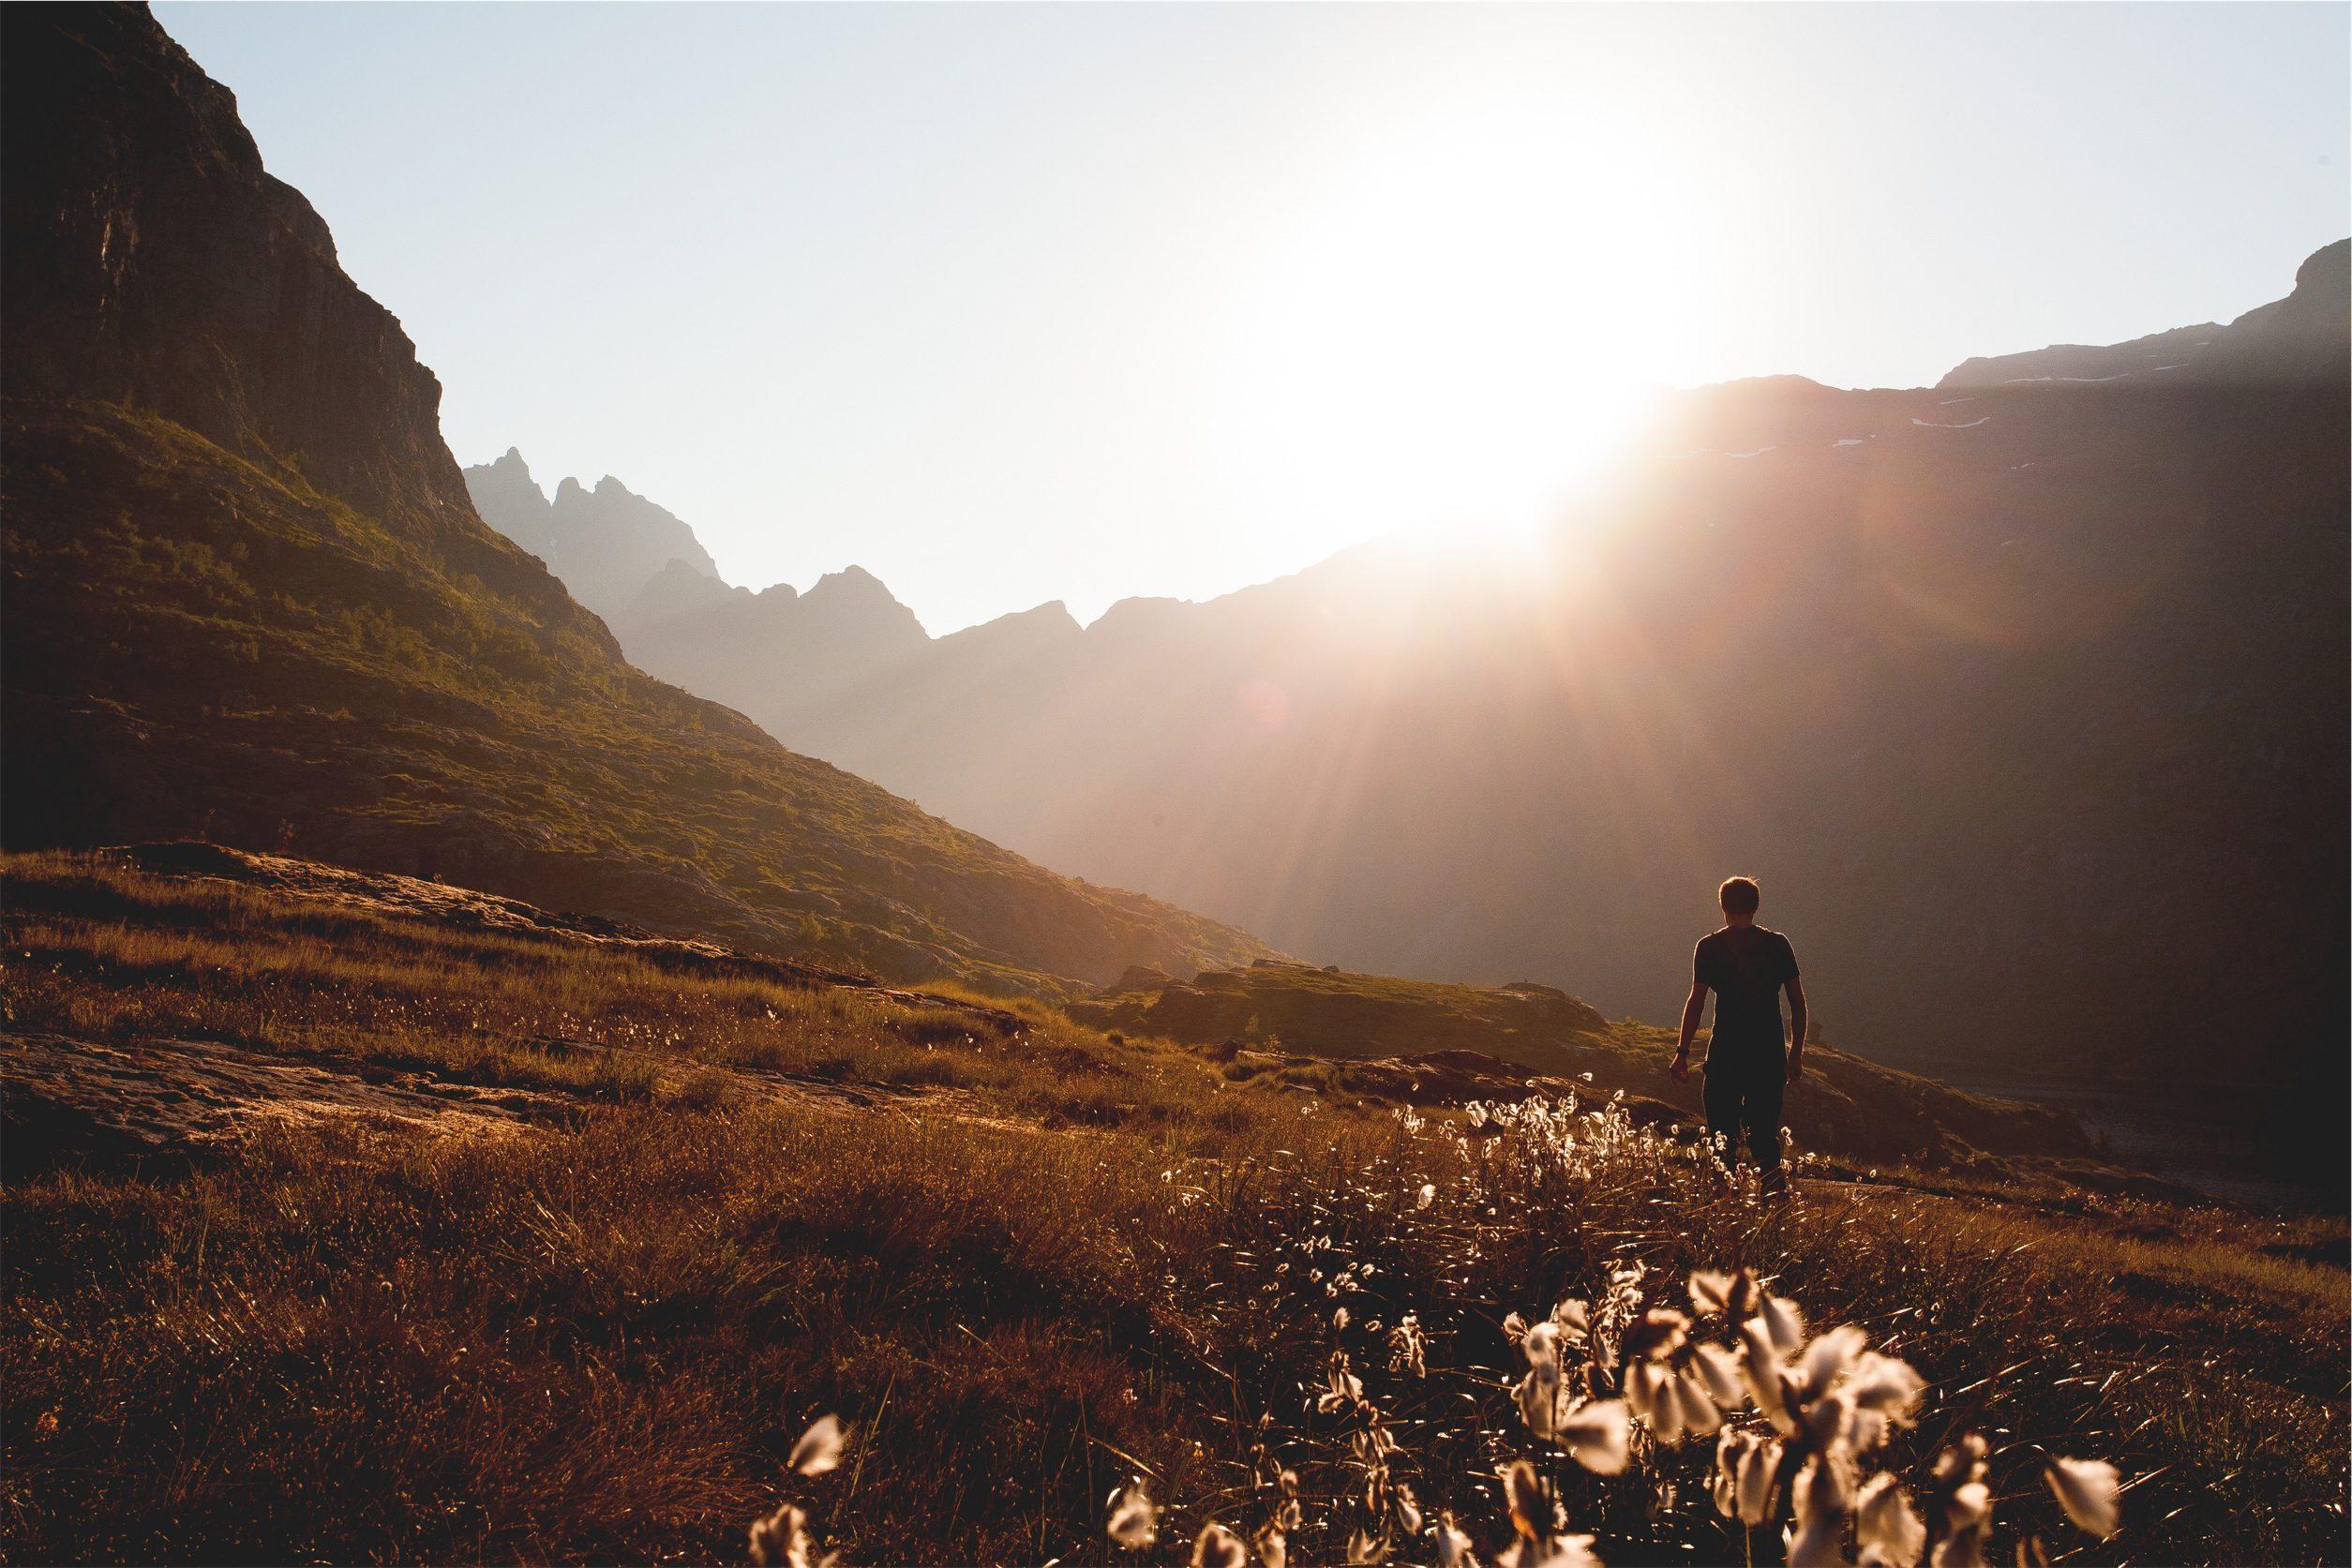 सूर्य, Pradera, आराम, आदमी, Montañas - HD वॉलपेपर - प्रोफेसर-falken.com